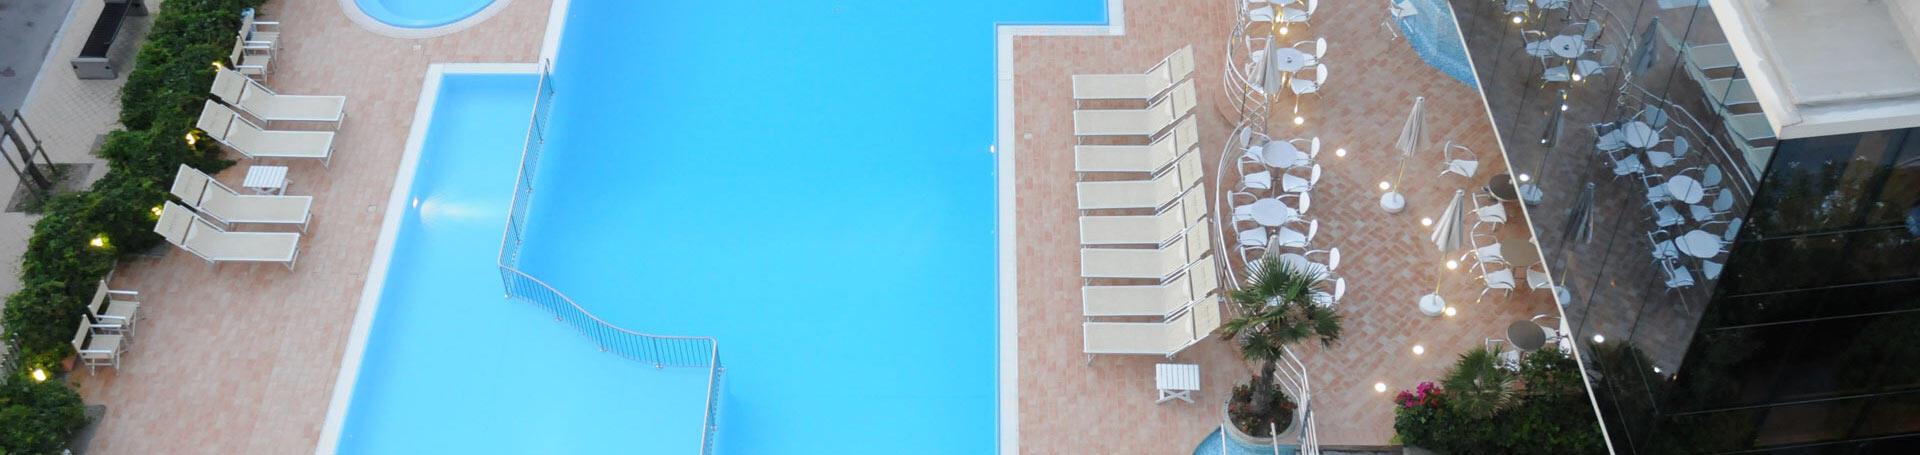 palacelidohotel fr piscine-rechaufee-lido-di-savio 011